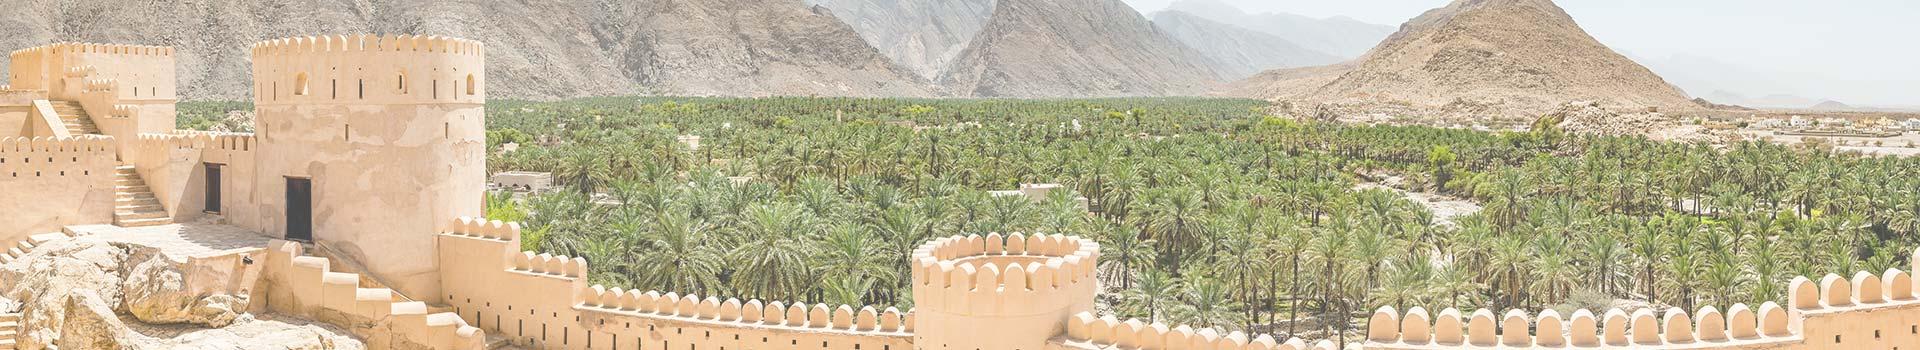 Oman - Individualreisen & Luxusreisen